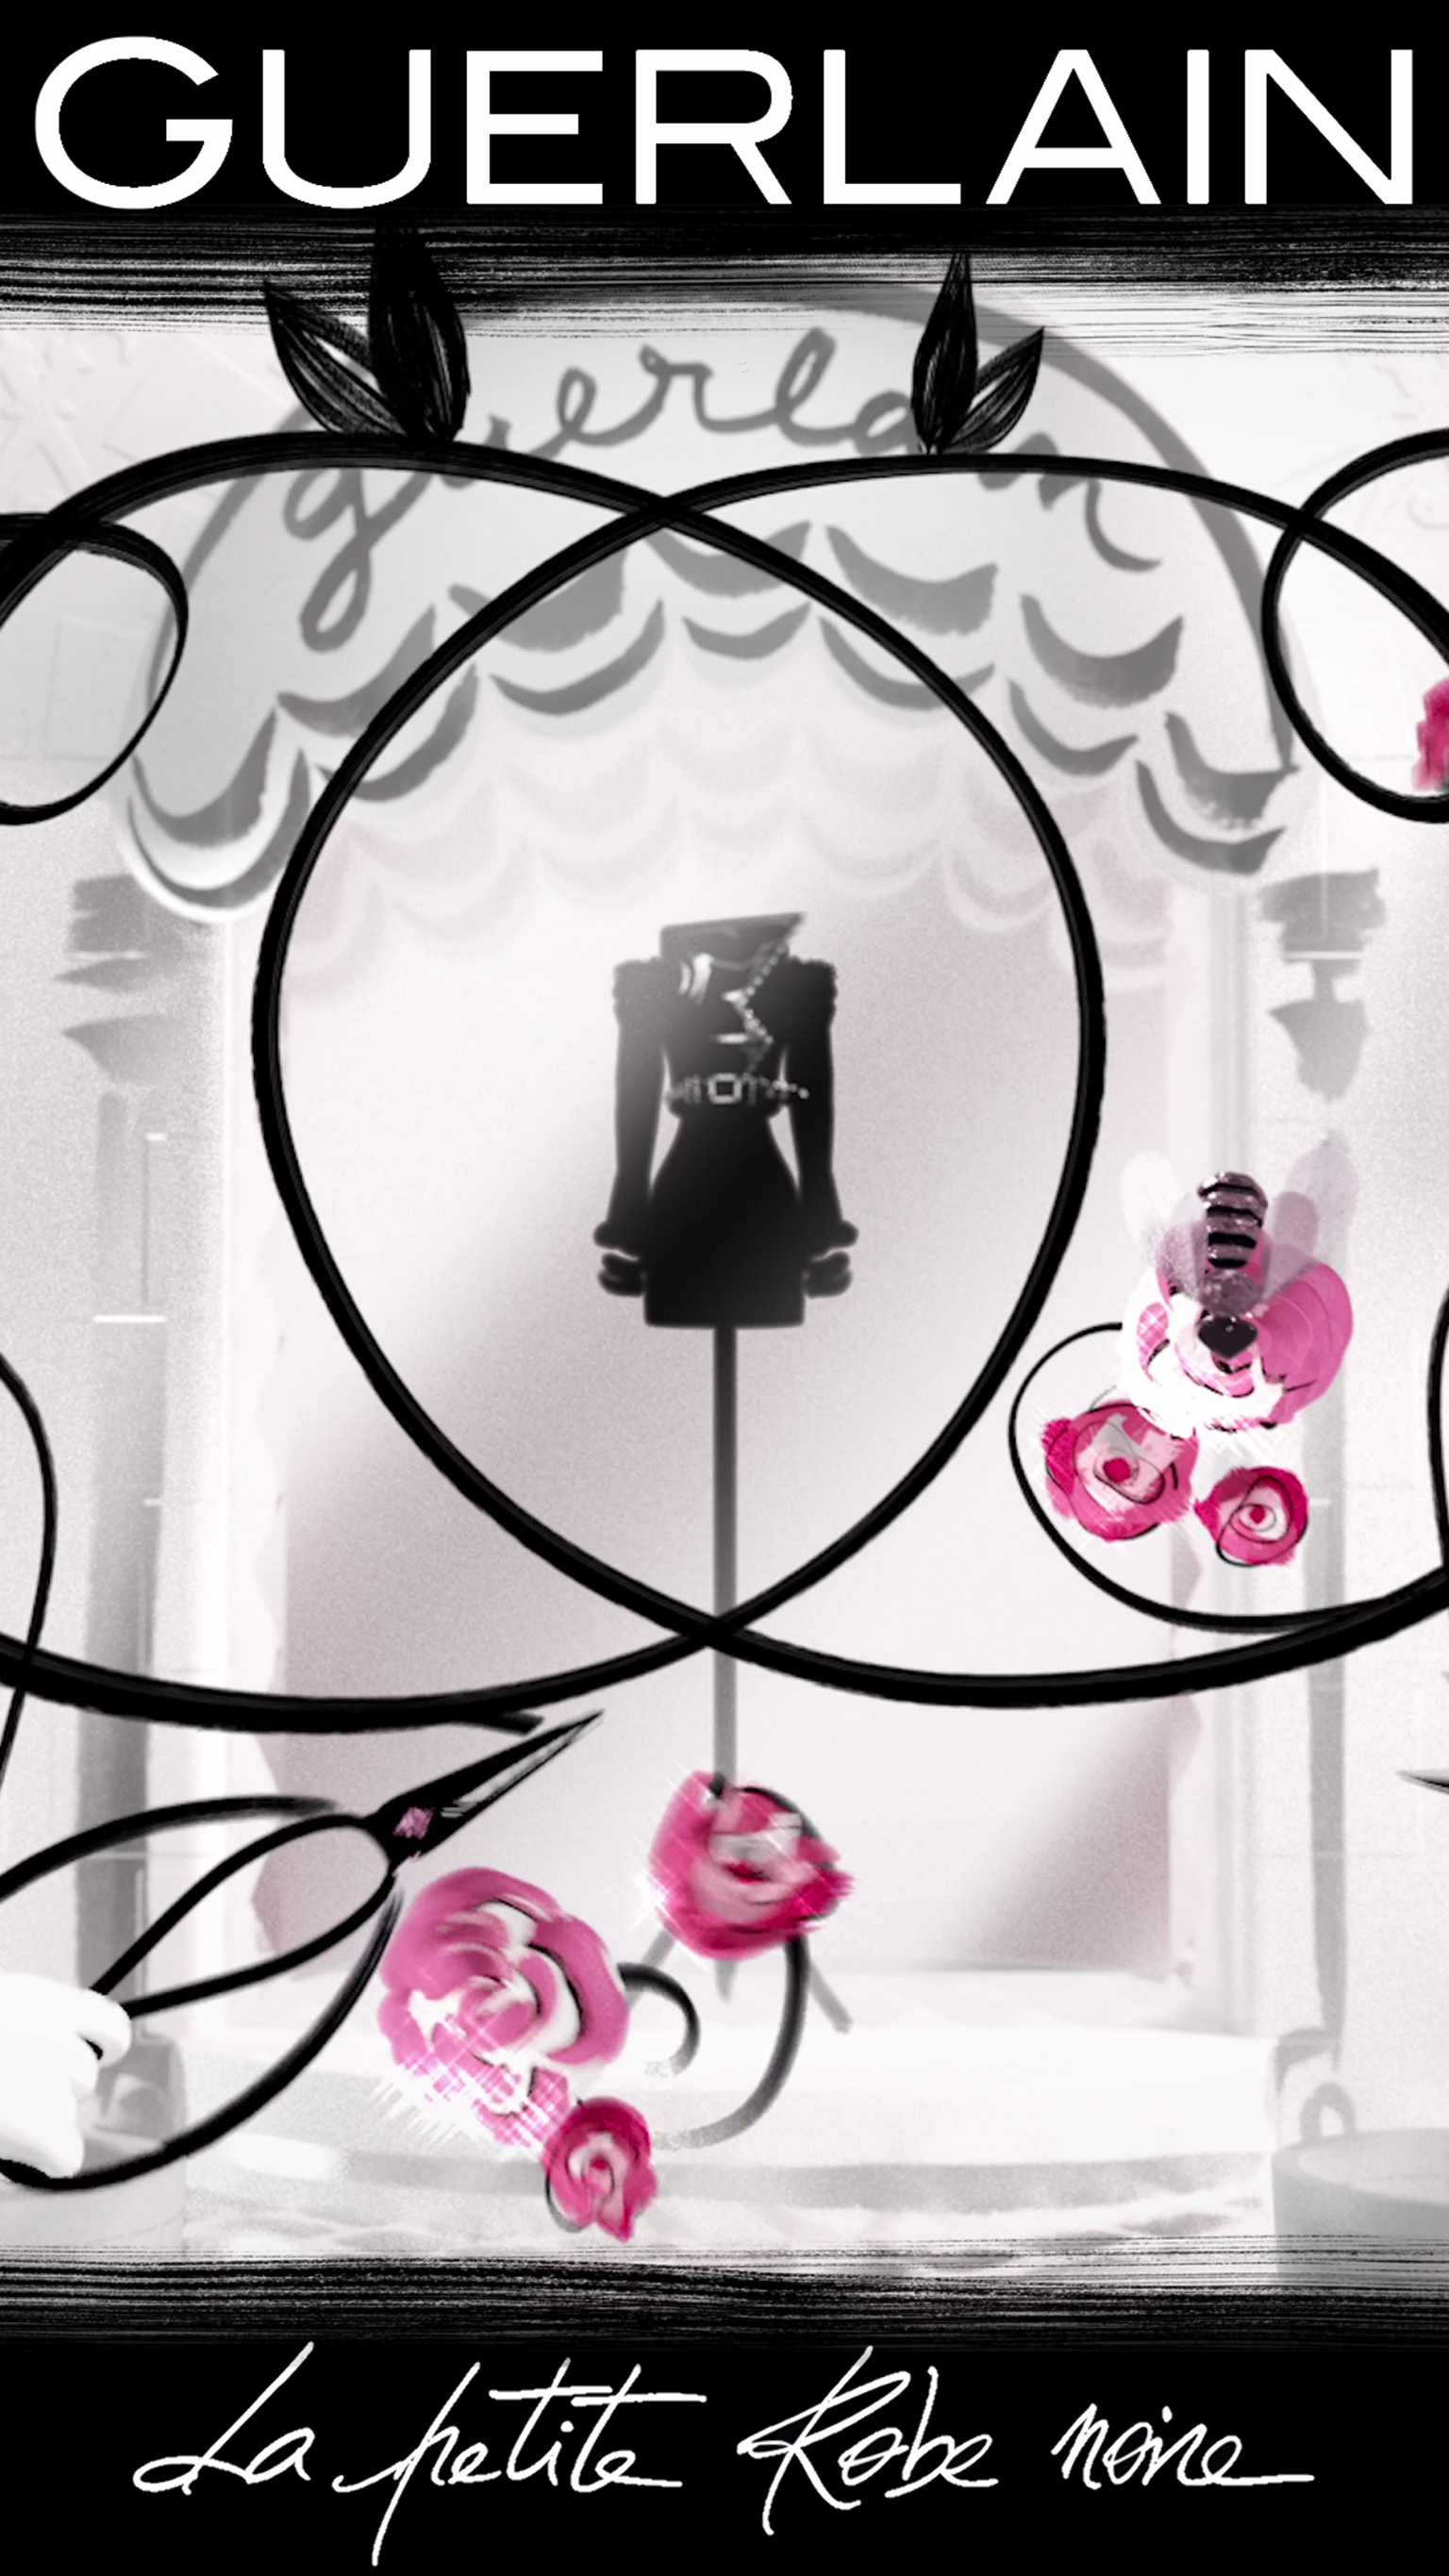 29b567f9440 Une Création Parfumée Signée Guerlain — Sicilfly